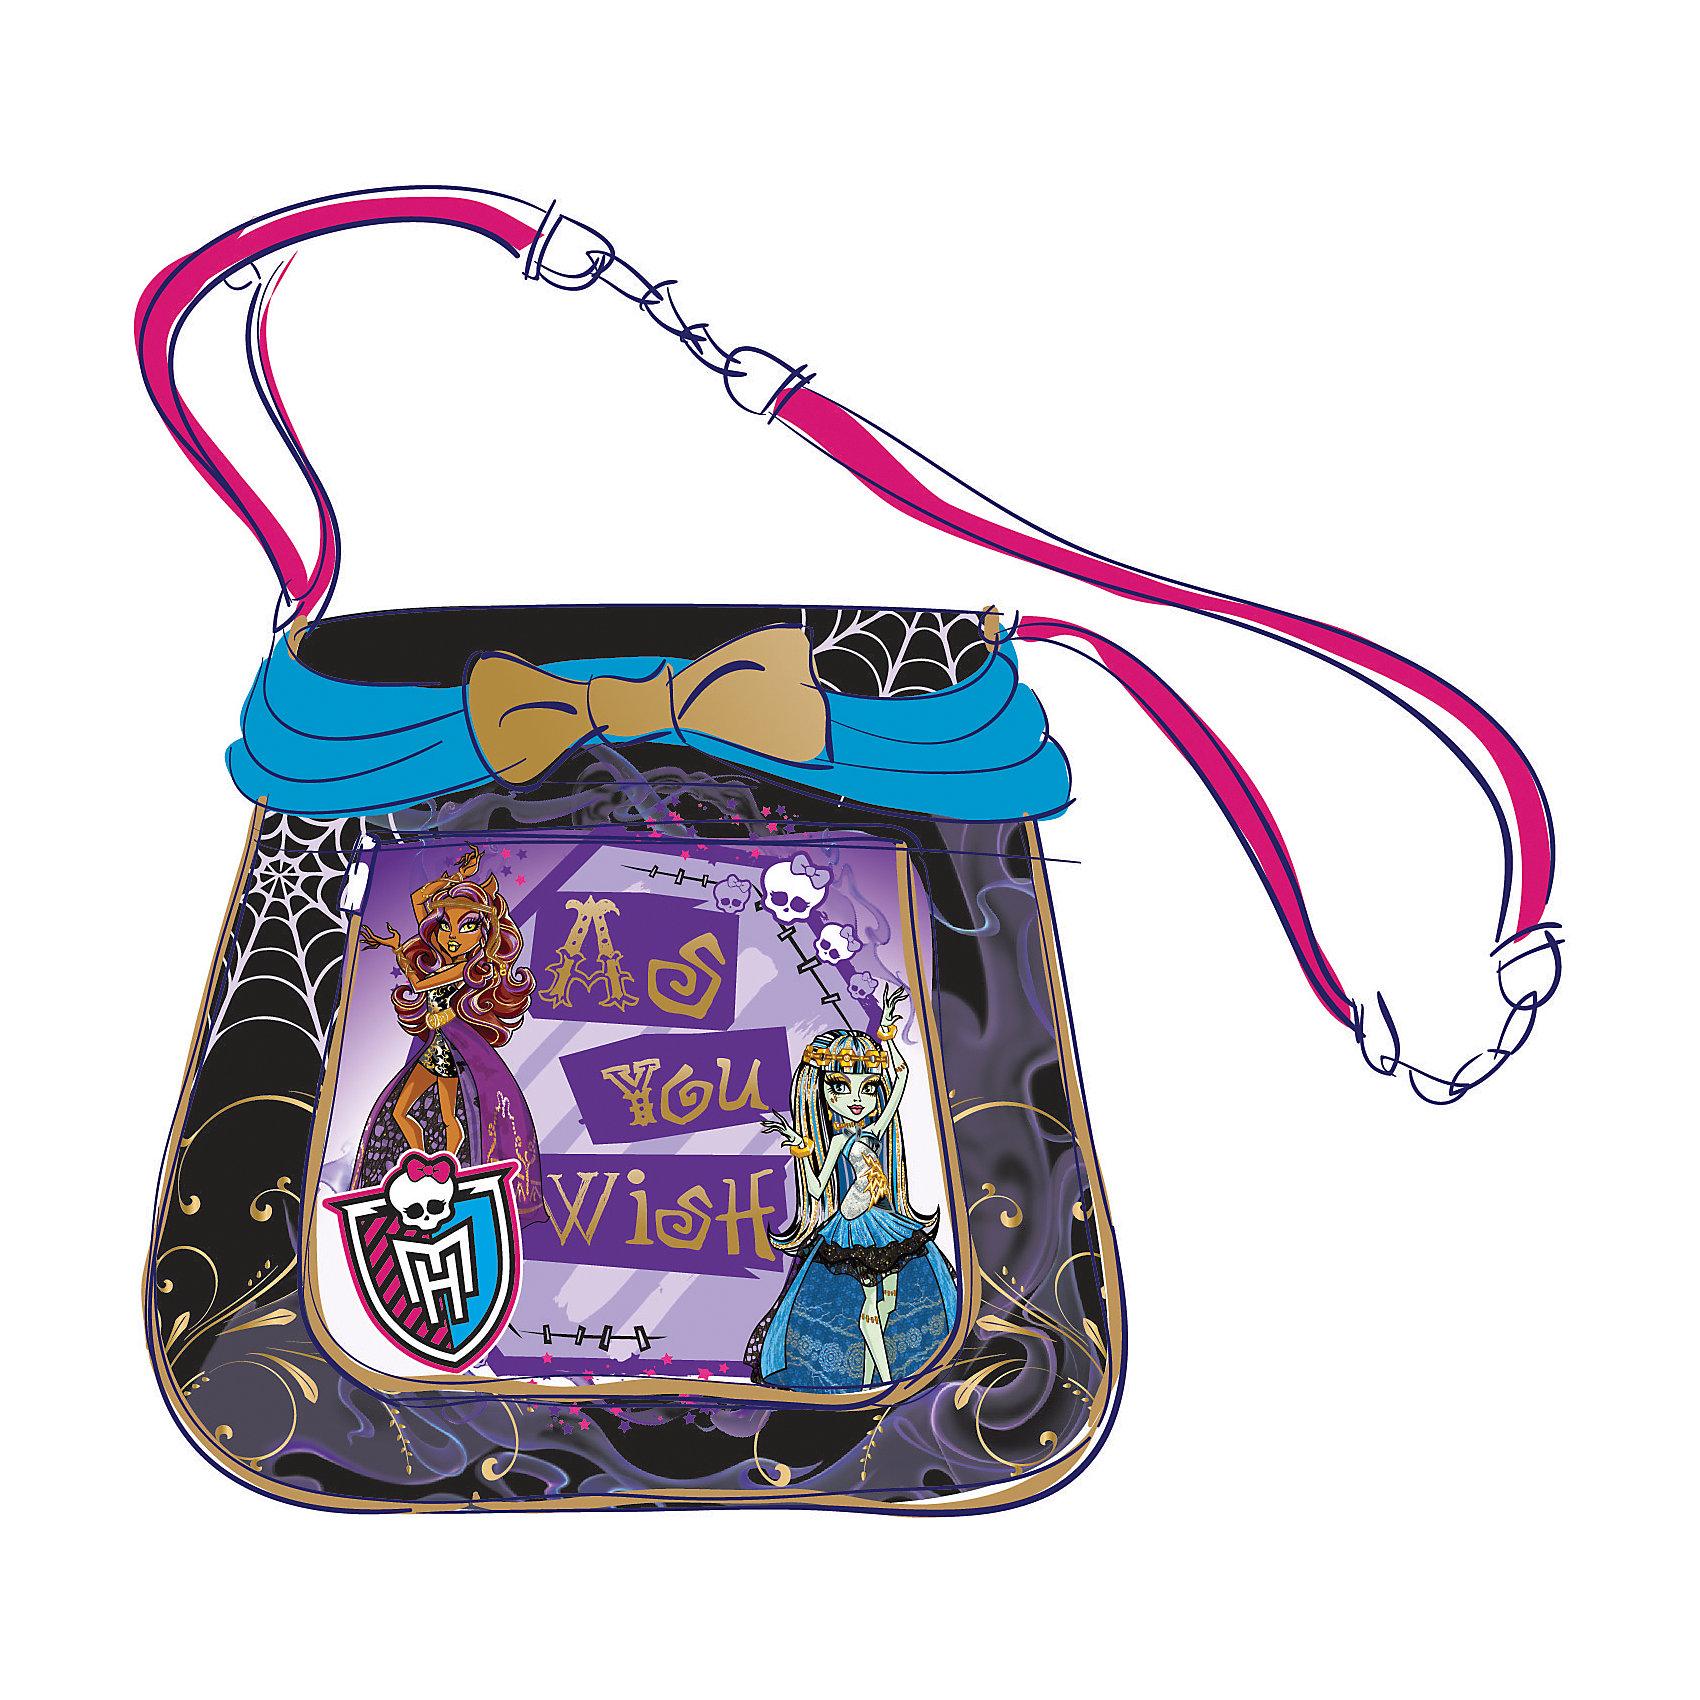 CENTRUM Сумка Monster High 27*24*3 см centrum пенал monster high цвет фиолетовый черный